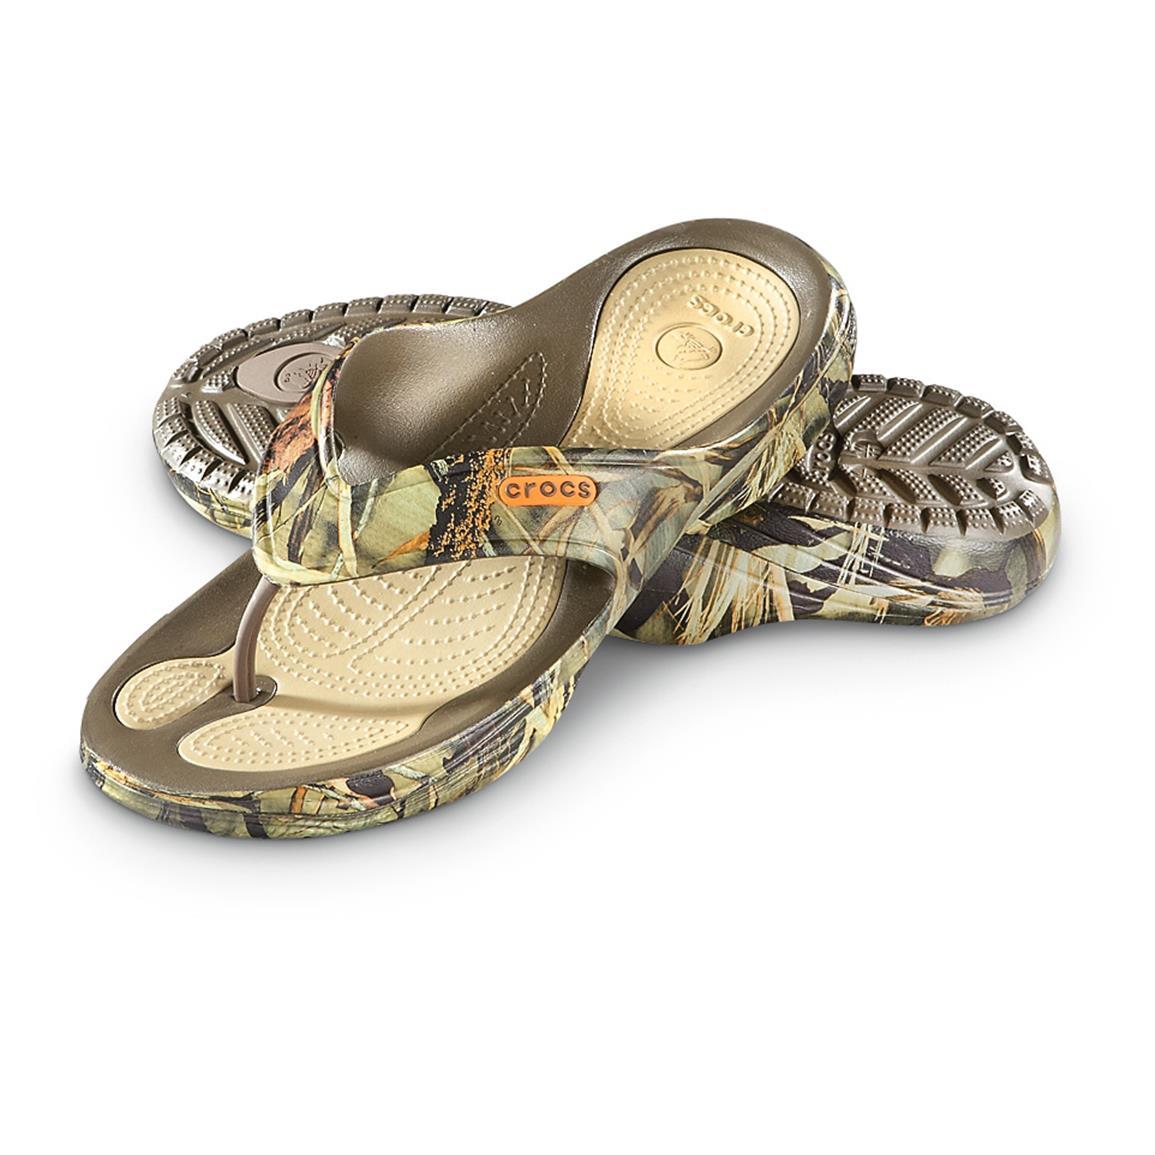 Crocs Modi Flip Flop | Croc Thong Sandals | Croc Flip Flops